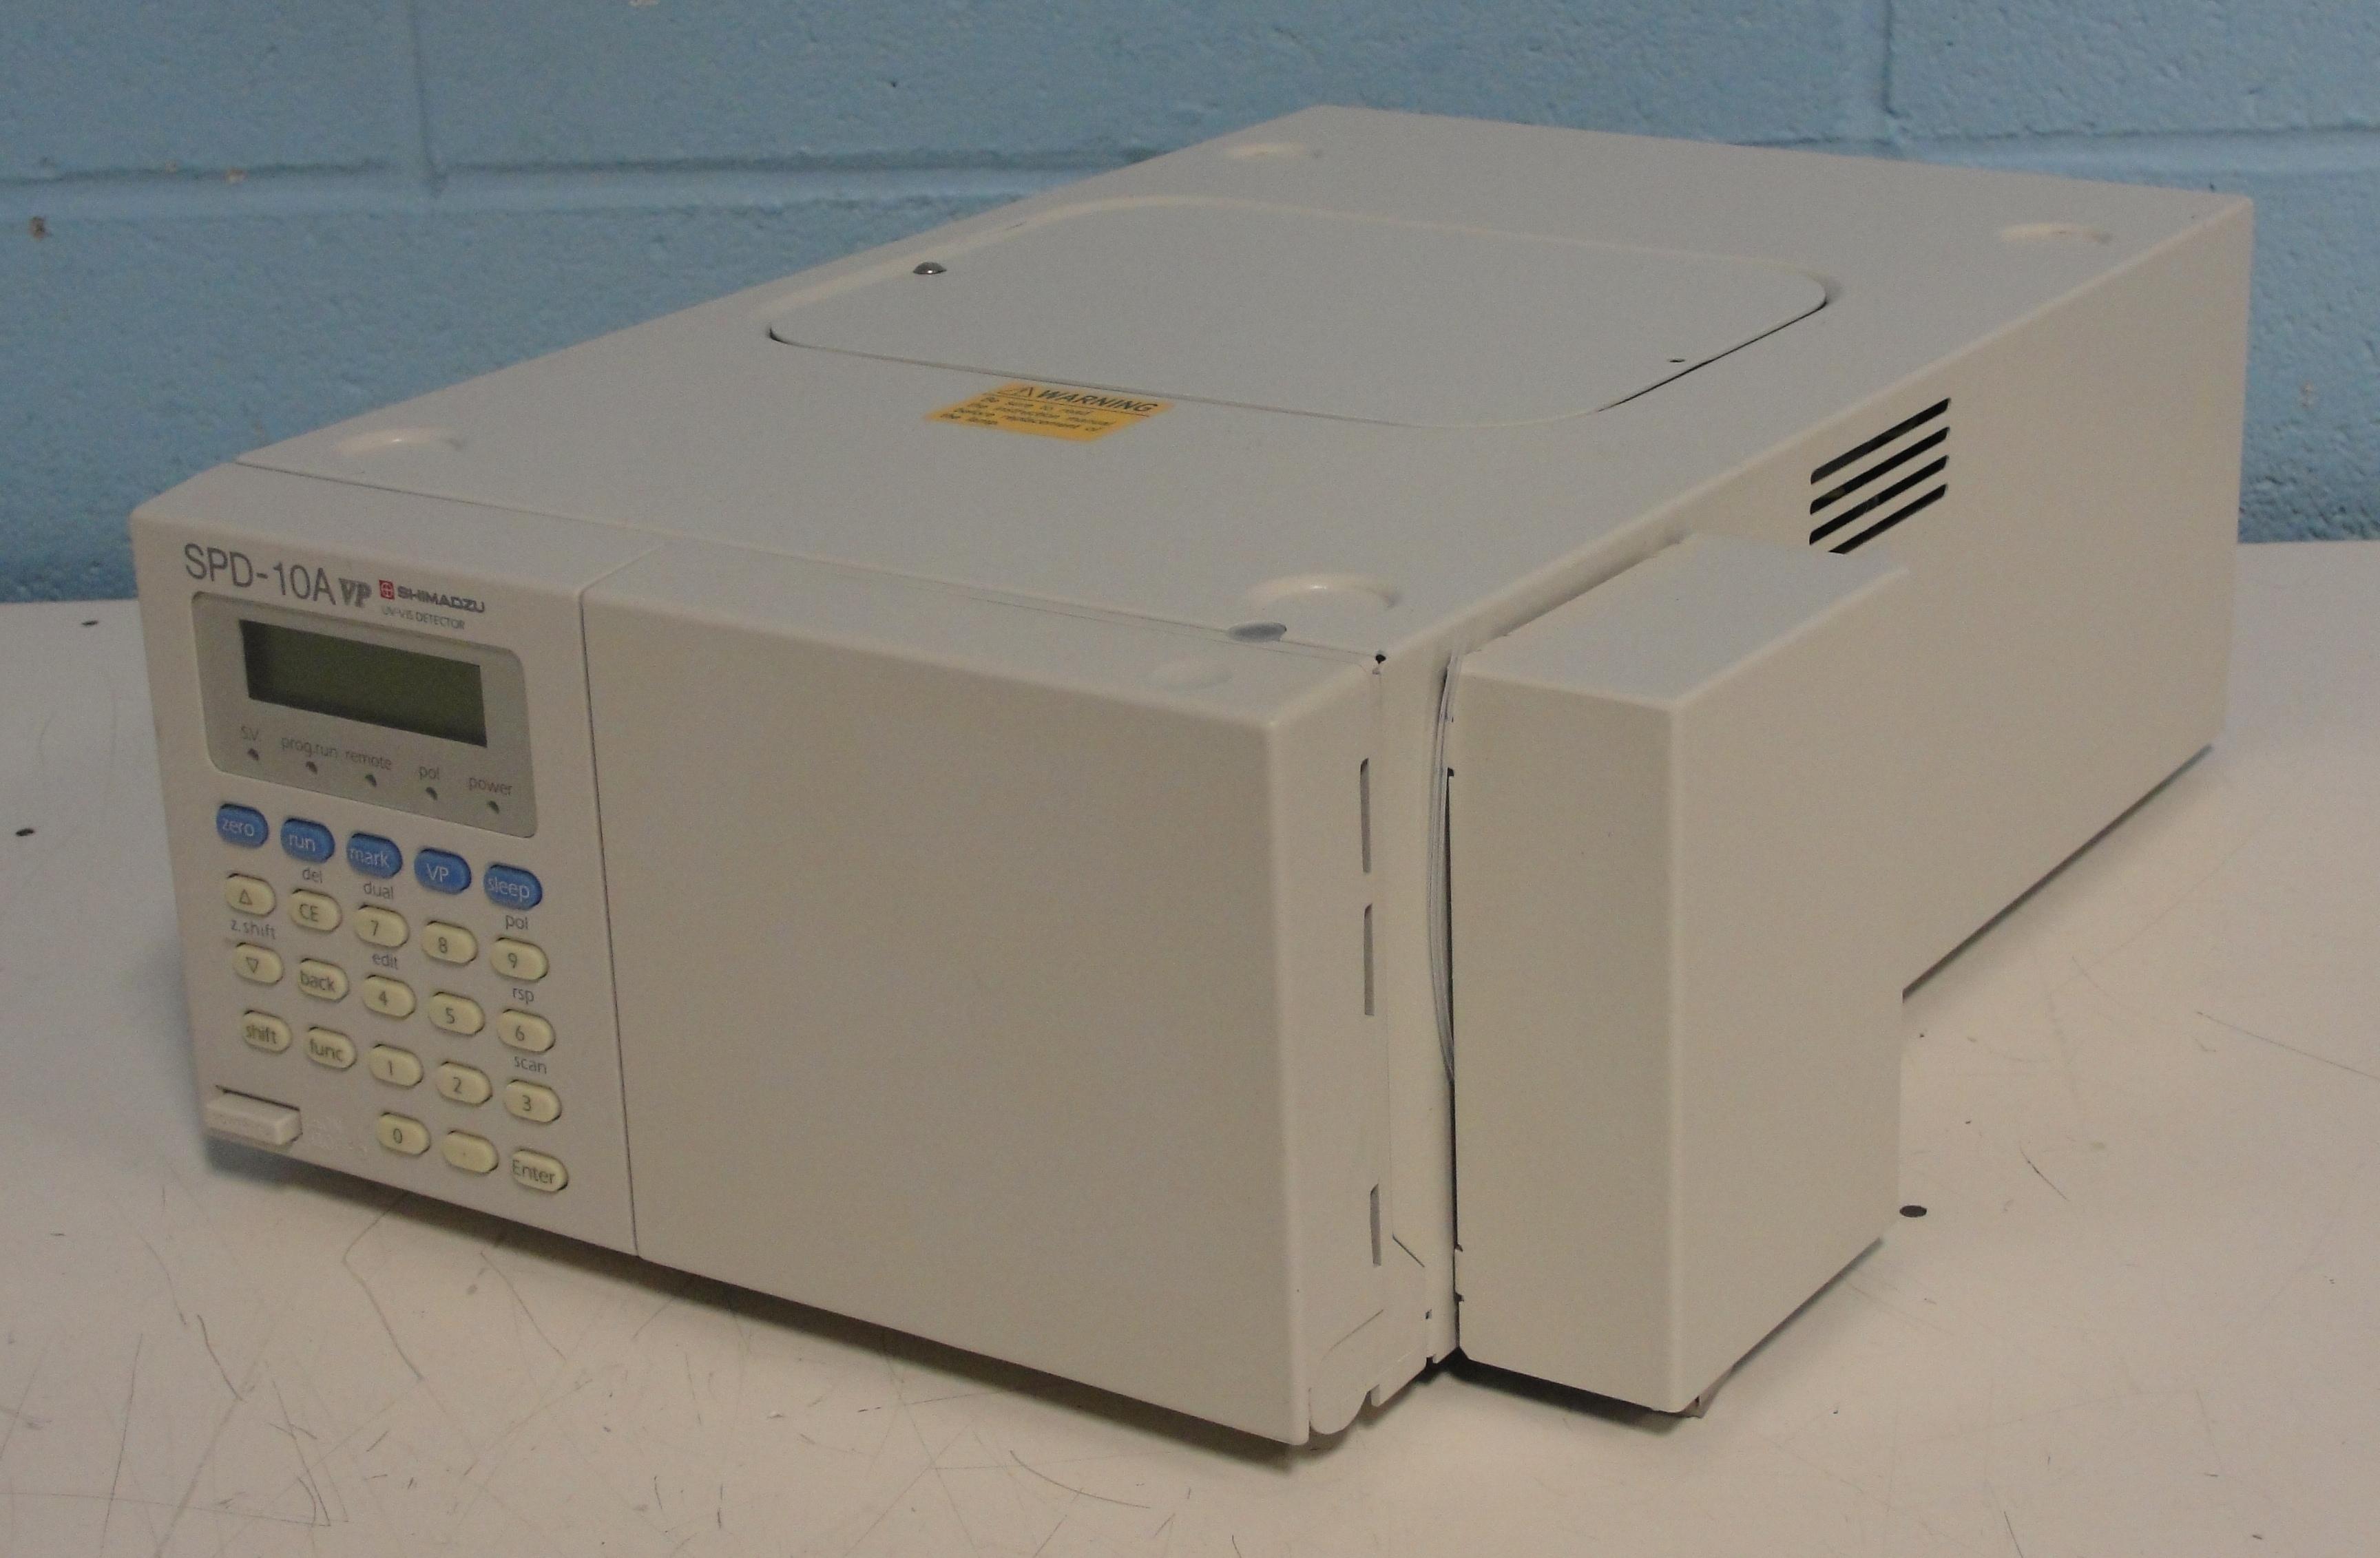 Refurbished Shimadzu SPD-10A VP UV-Vis Detector